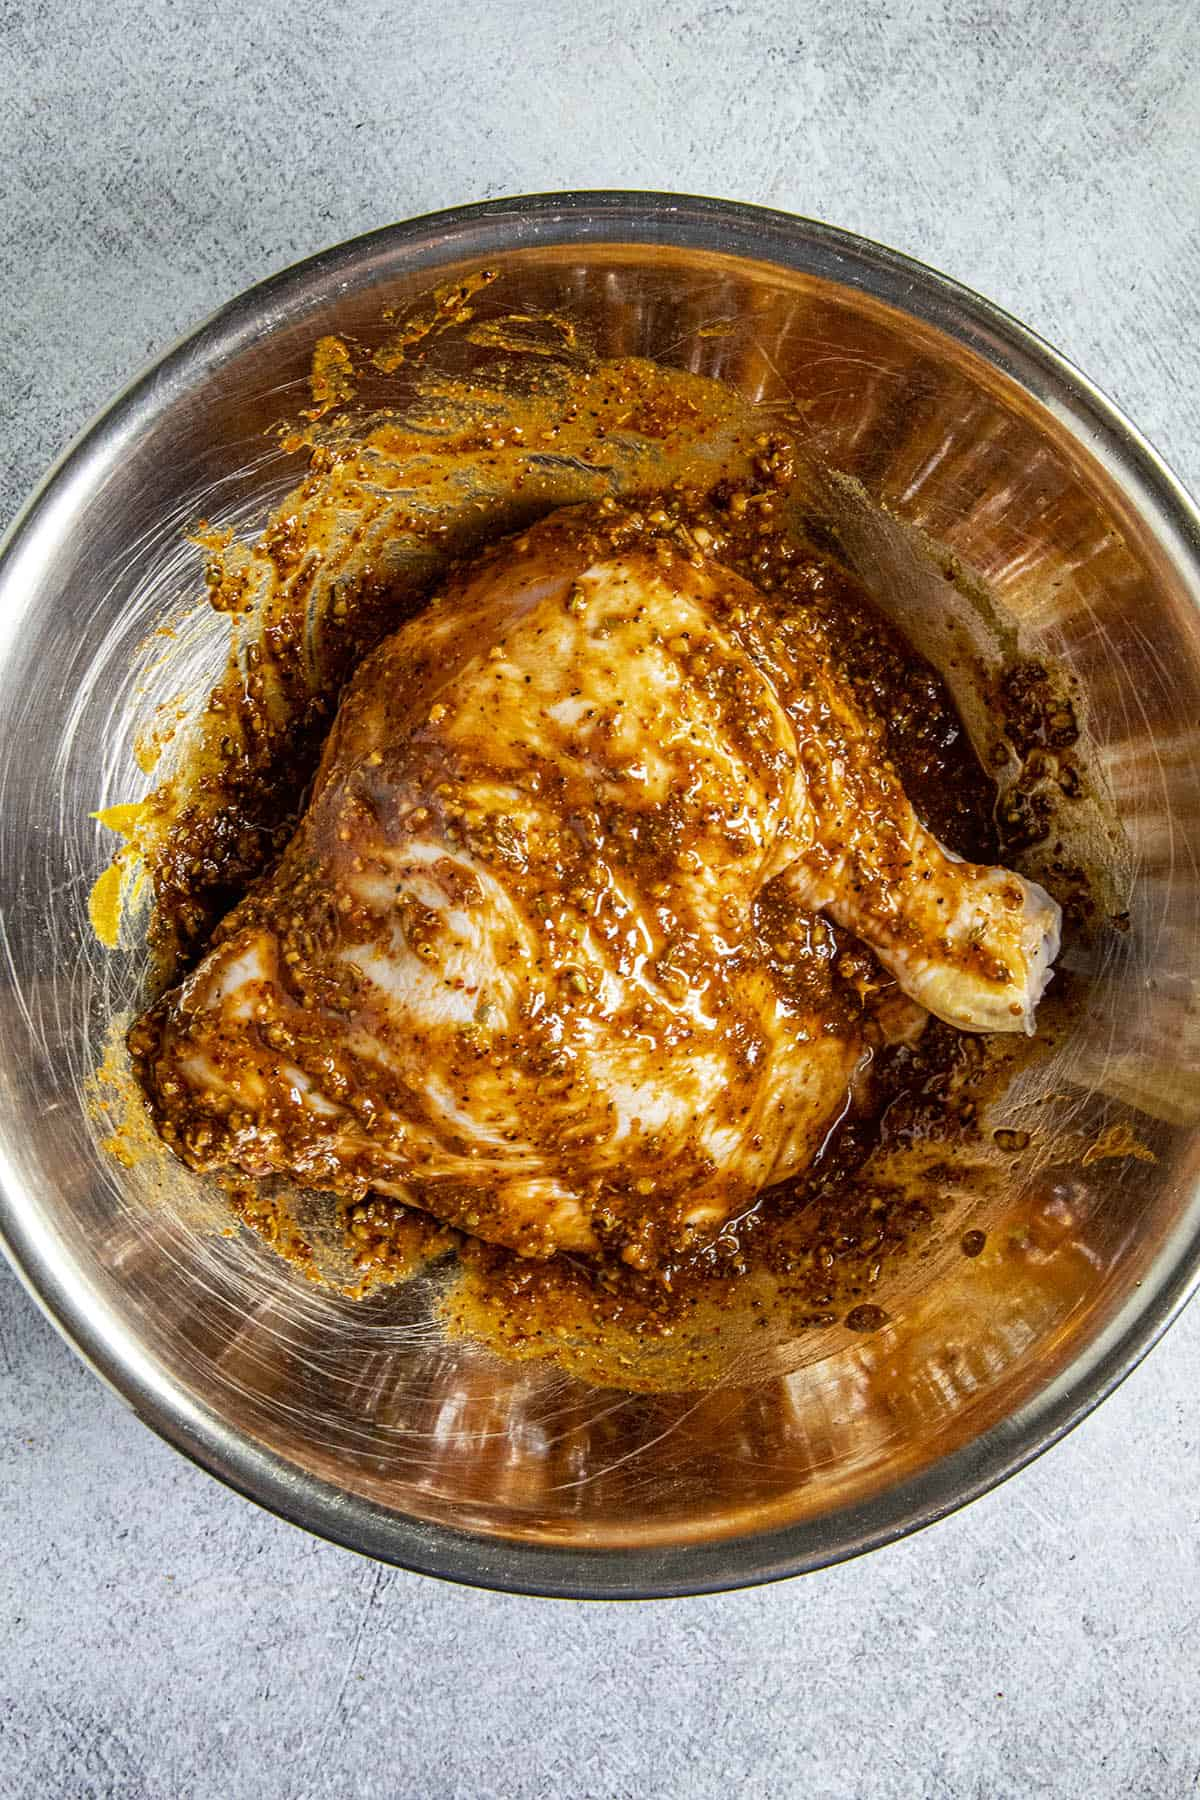 Peruvian Chicken rubbed down with Peruvian chili paste and spices